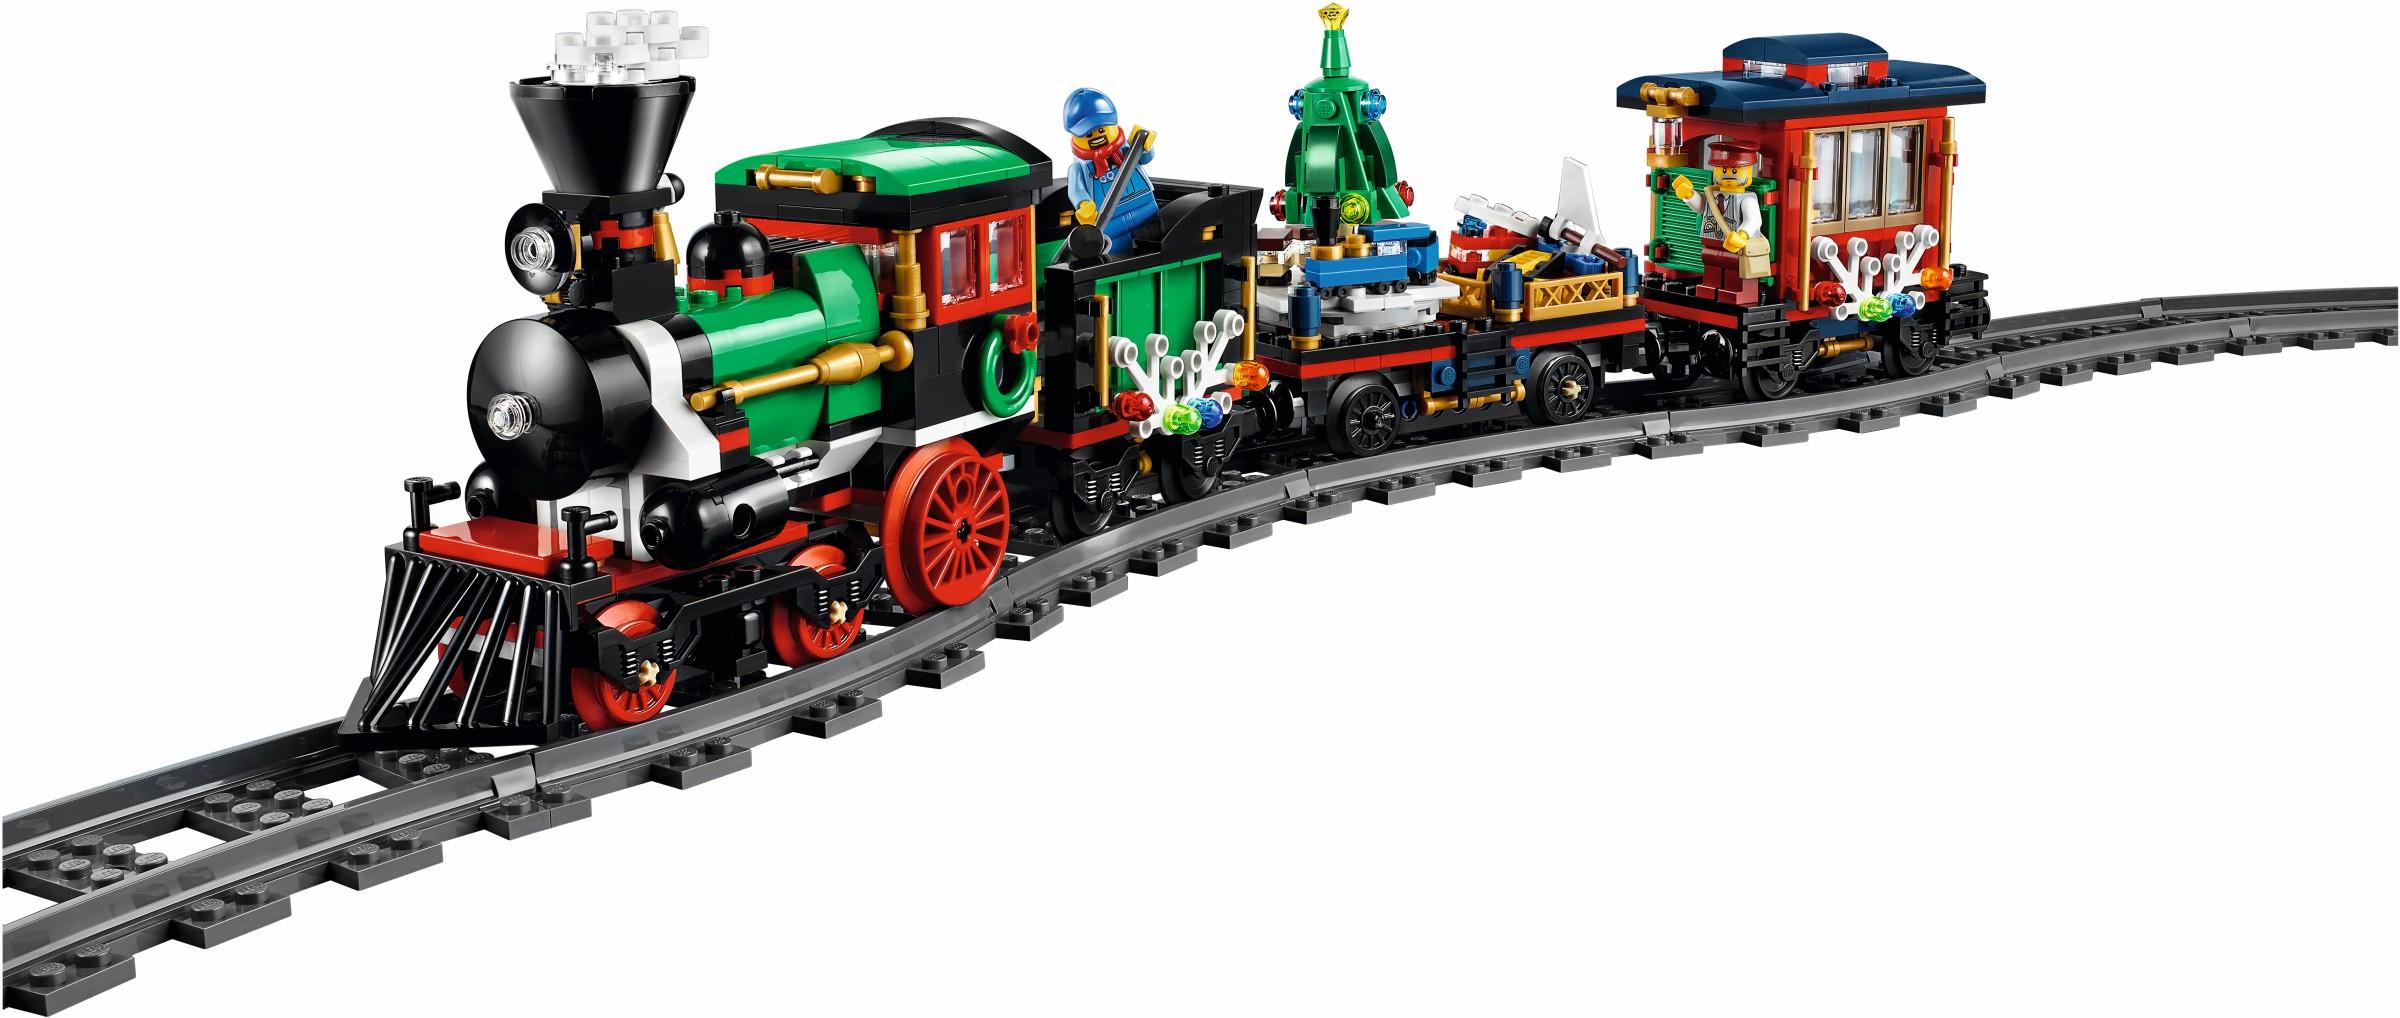 новогодний лего поезд